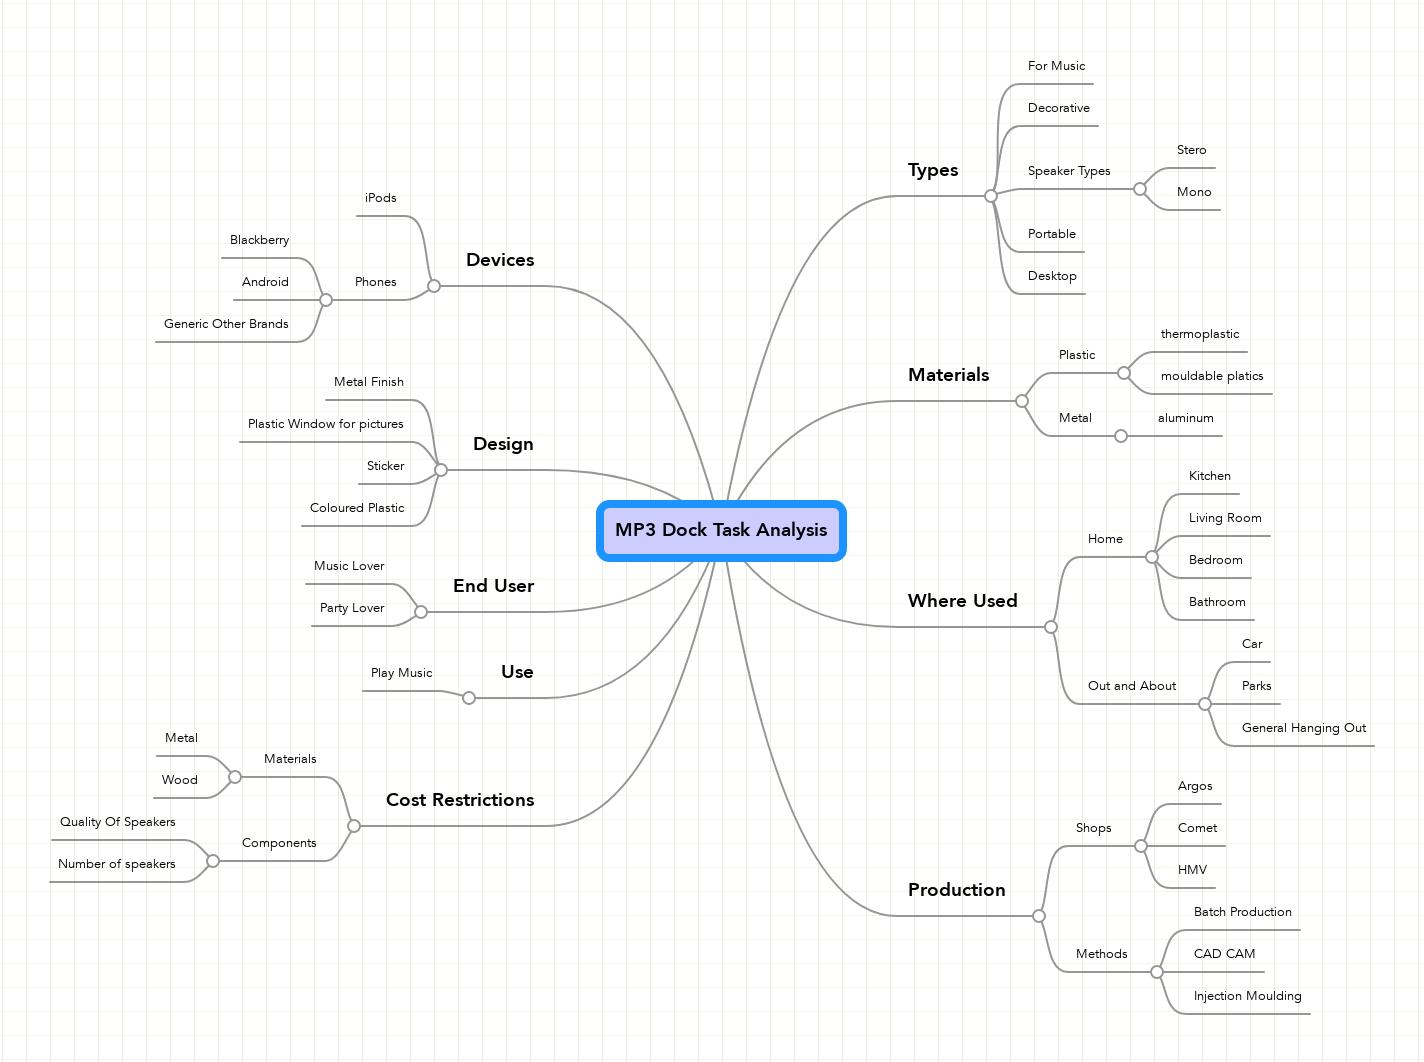 mp3 dock task analysis